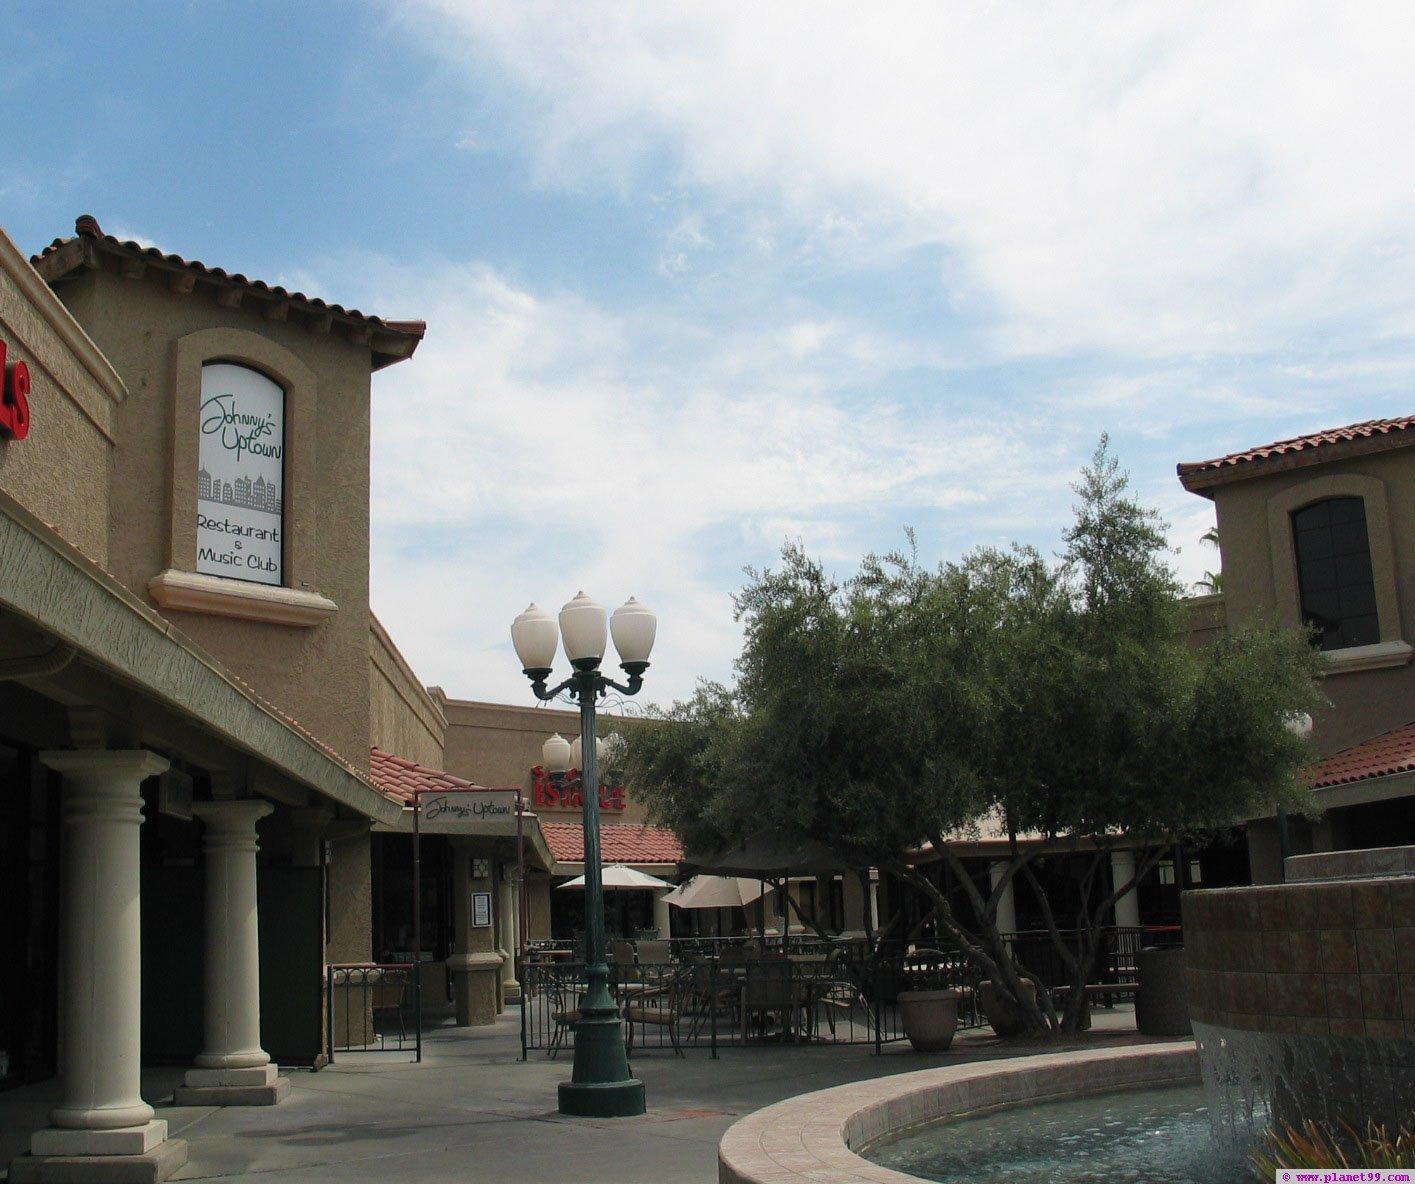 Johnny's Uptown Restaurant and Music Club , Phoenix